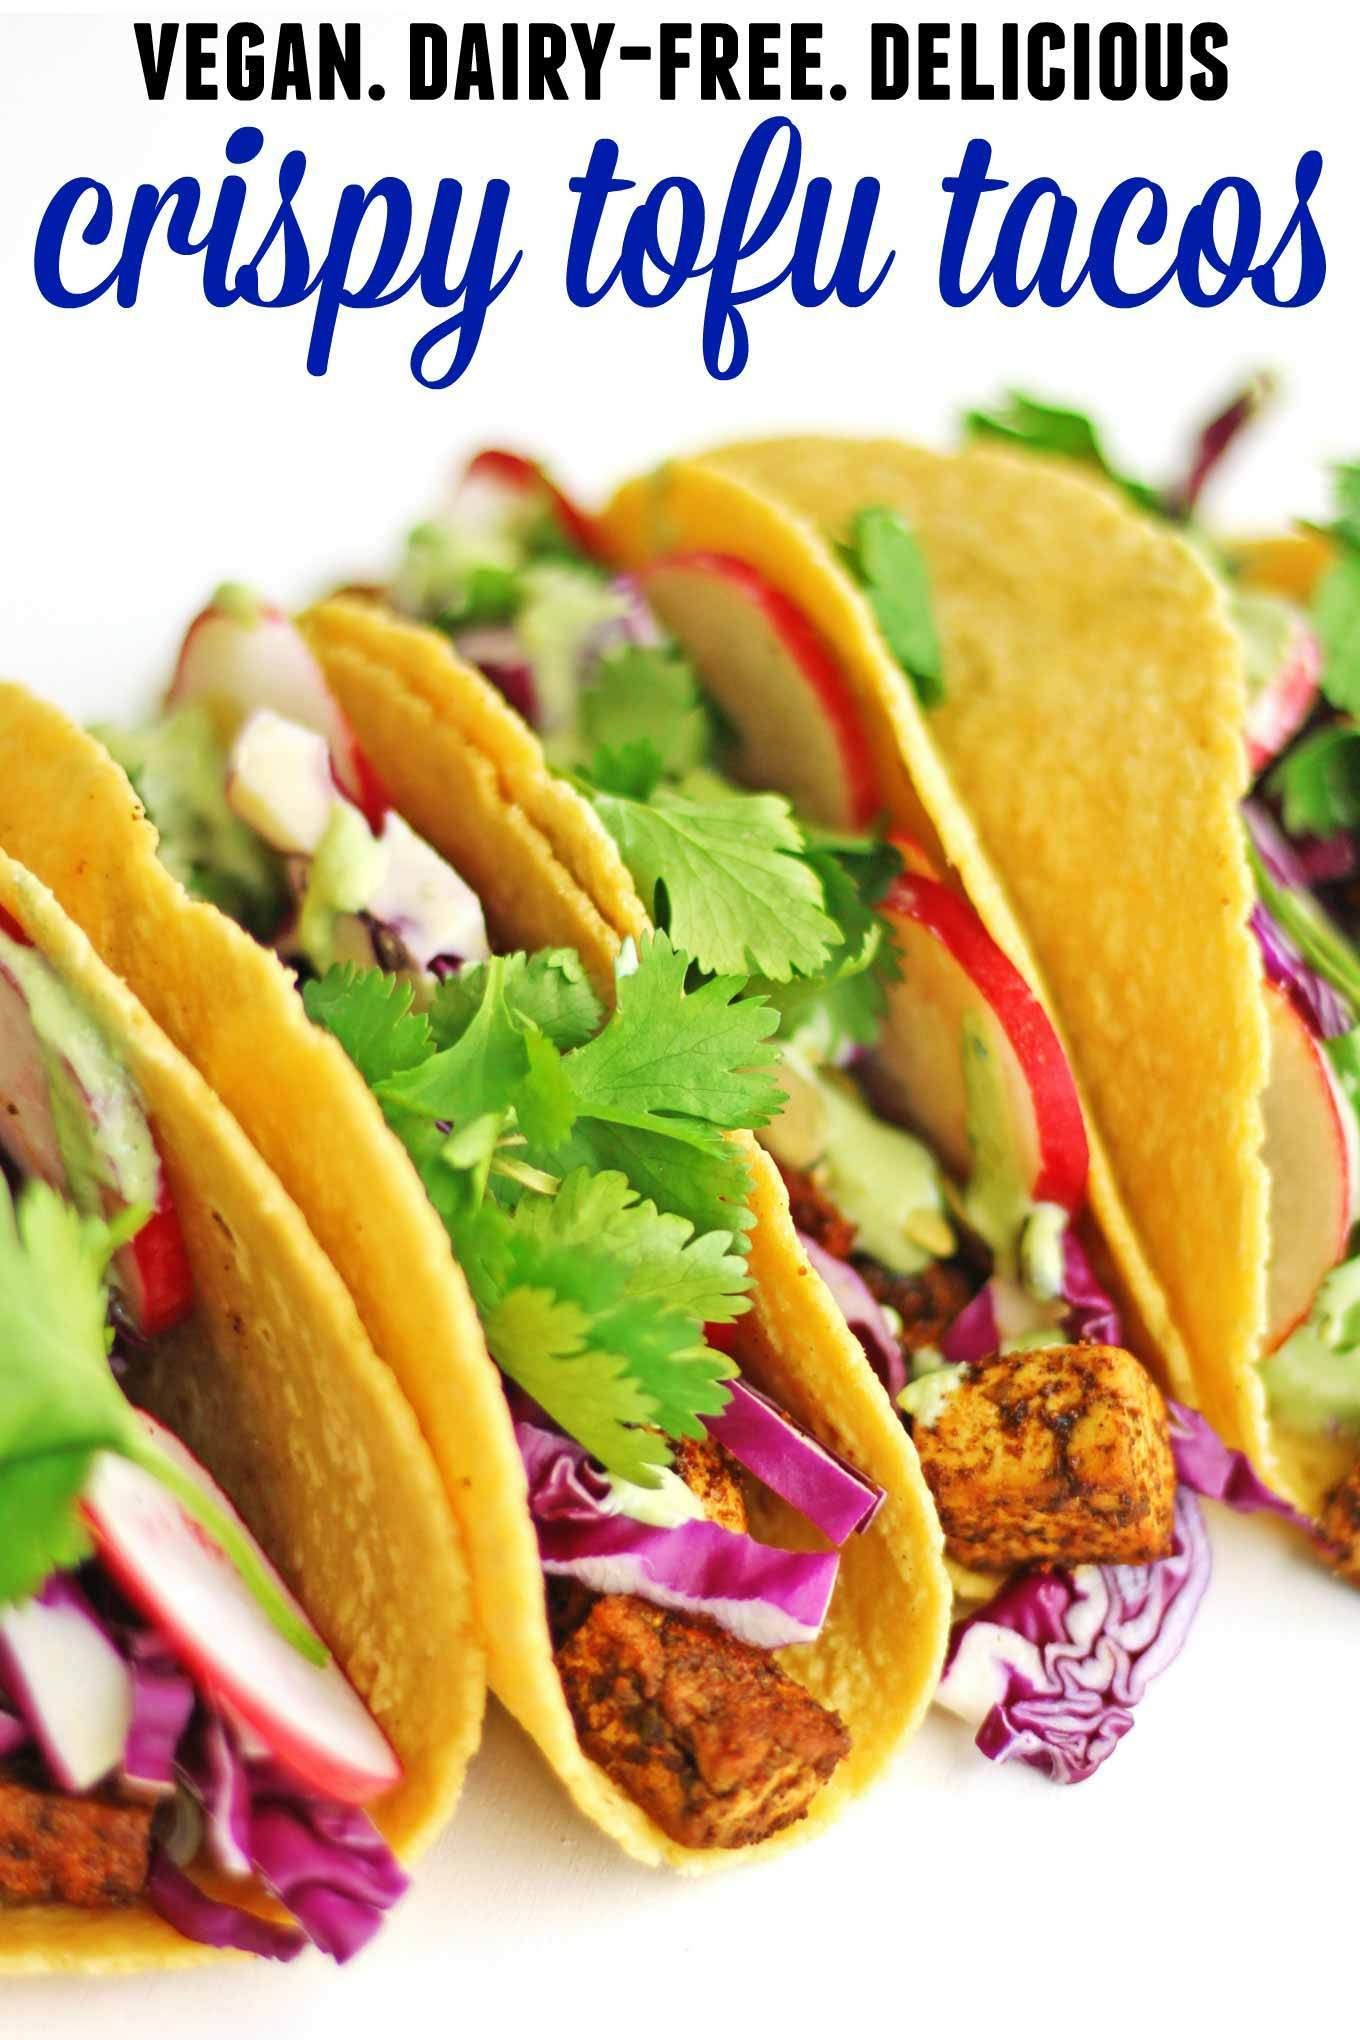 Crispy Vegan Tofu Tacos With Spicy Cilantro Sauce Rhubarbarians Recipe Tofu Recipes Tofu Tacos Tofu Recipes Vegan